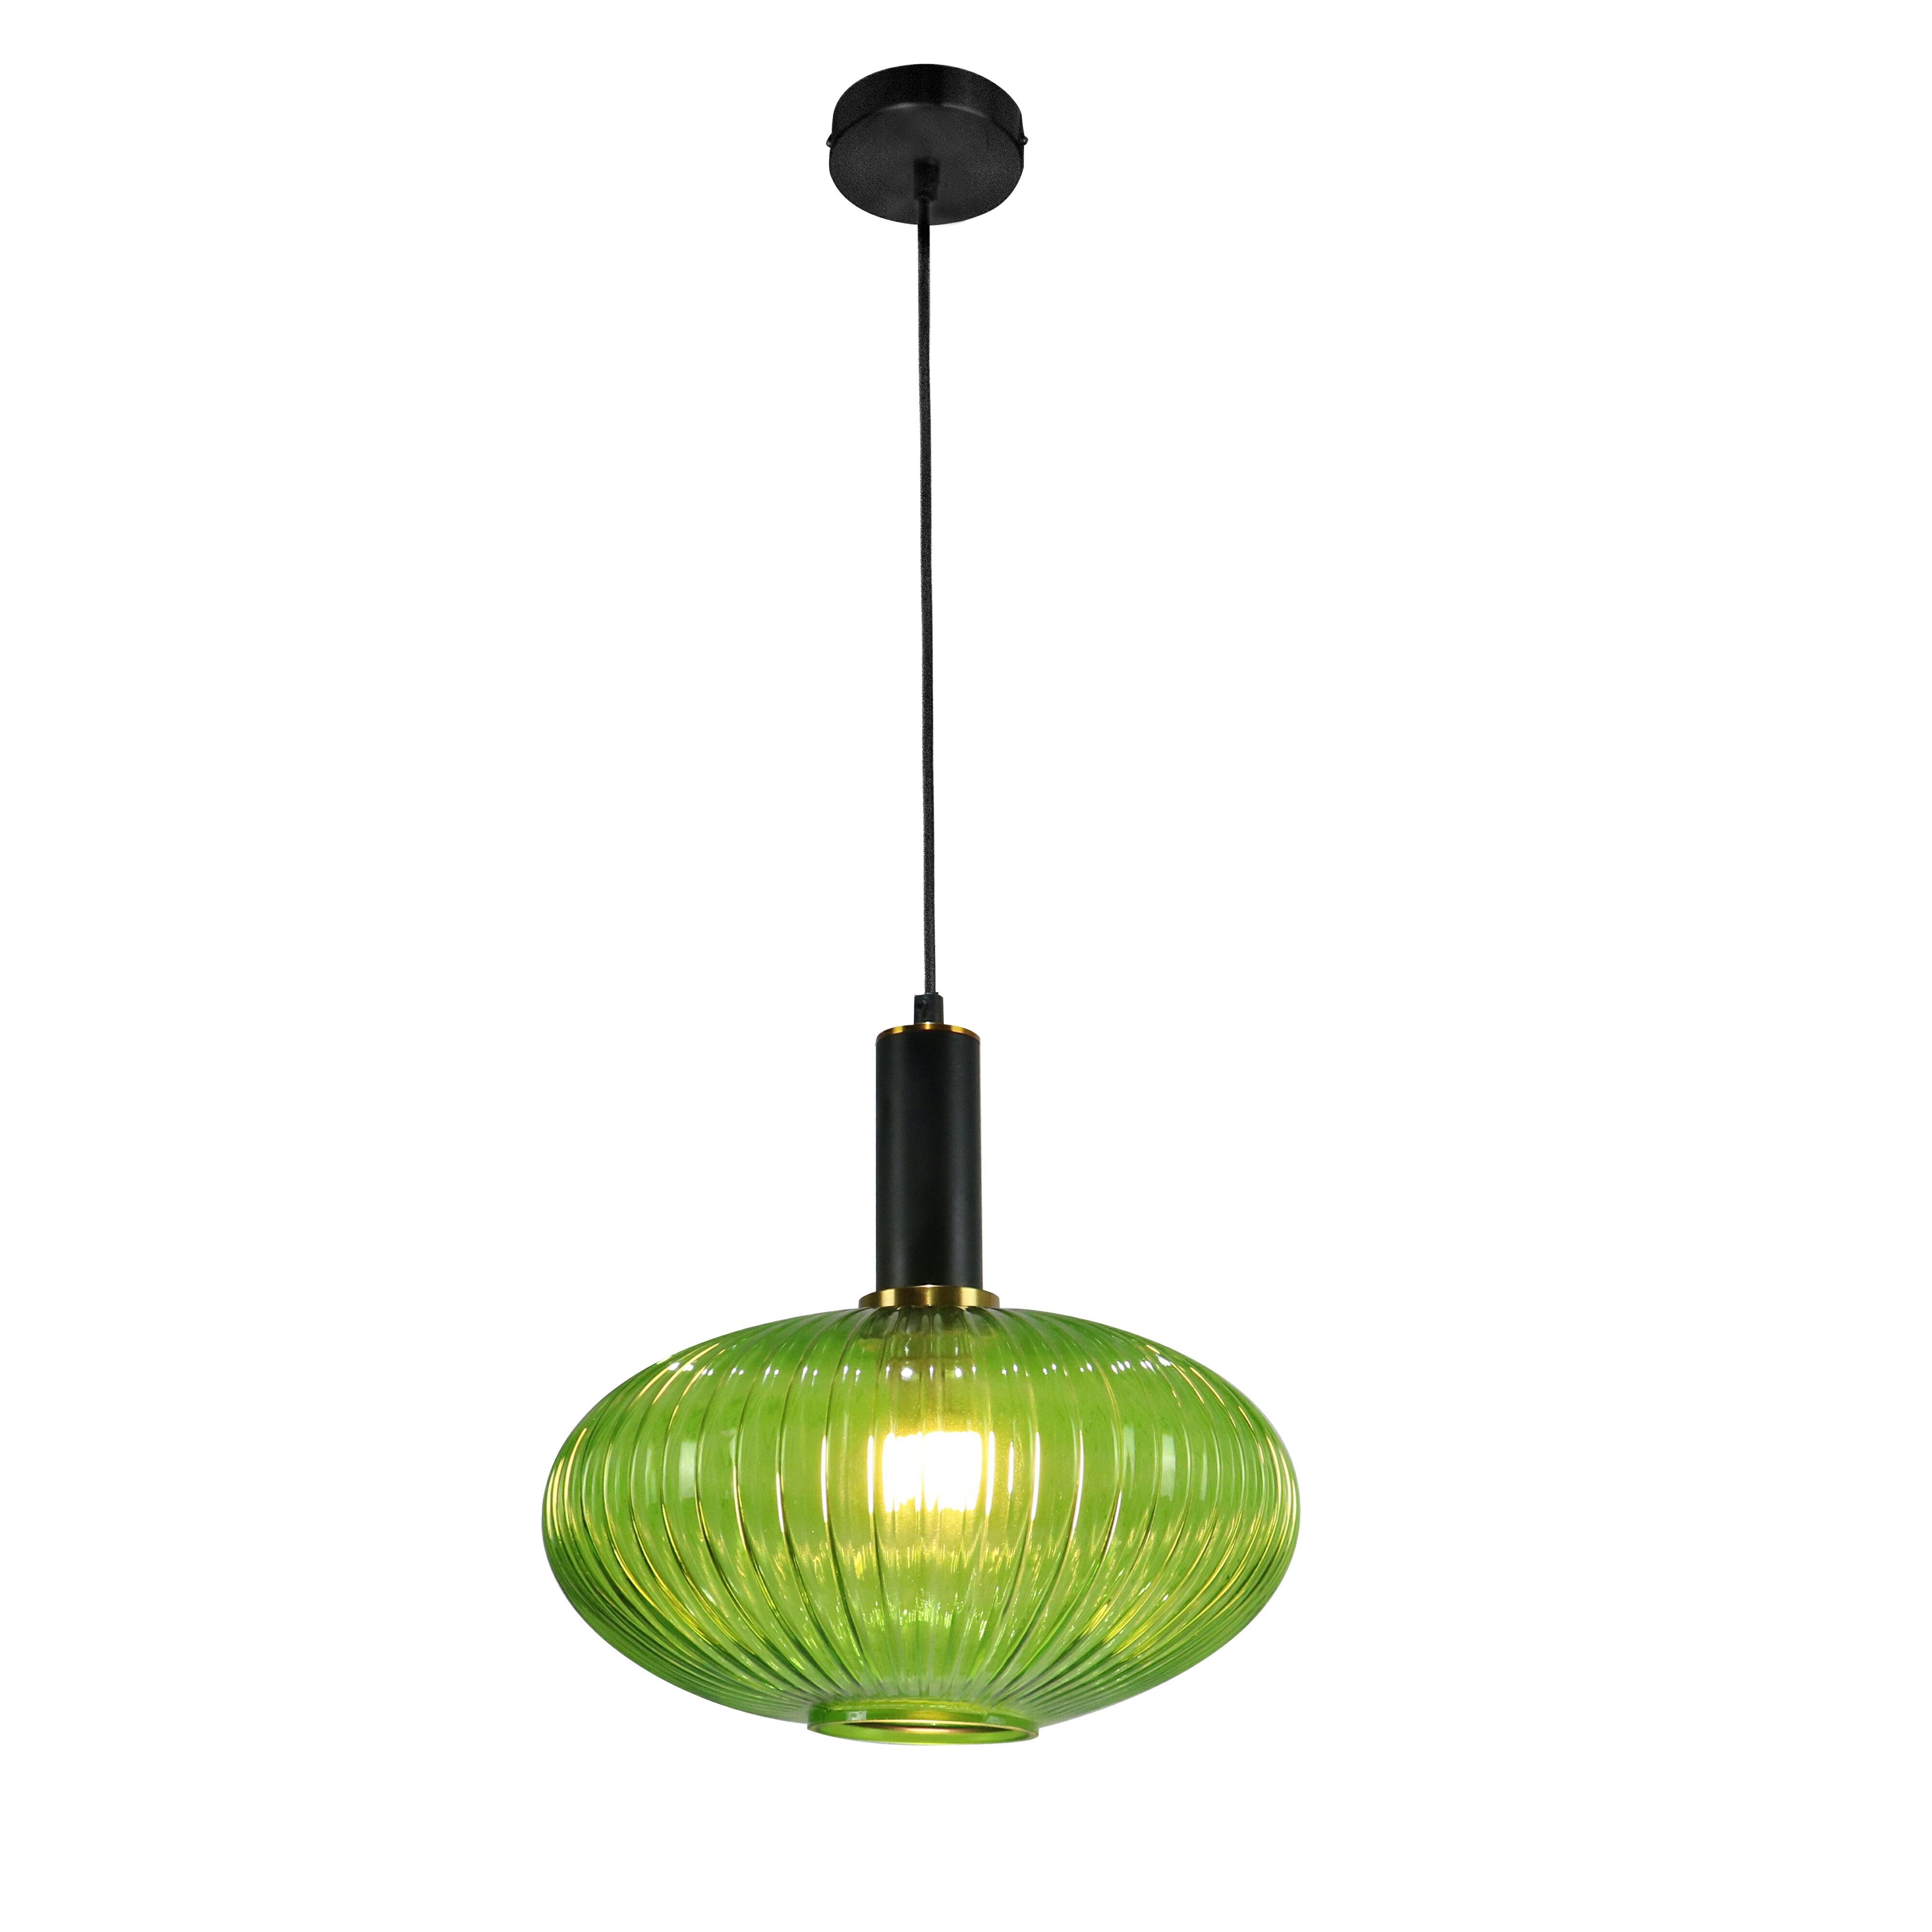 Lassen Retro Pendant Light Fixture With Vintage Oval Glass Shade Decorative Home Foyer Living Room Or Dining Decor Elegant Overhead Lighting Long